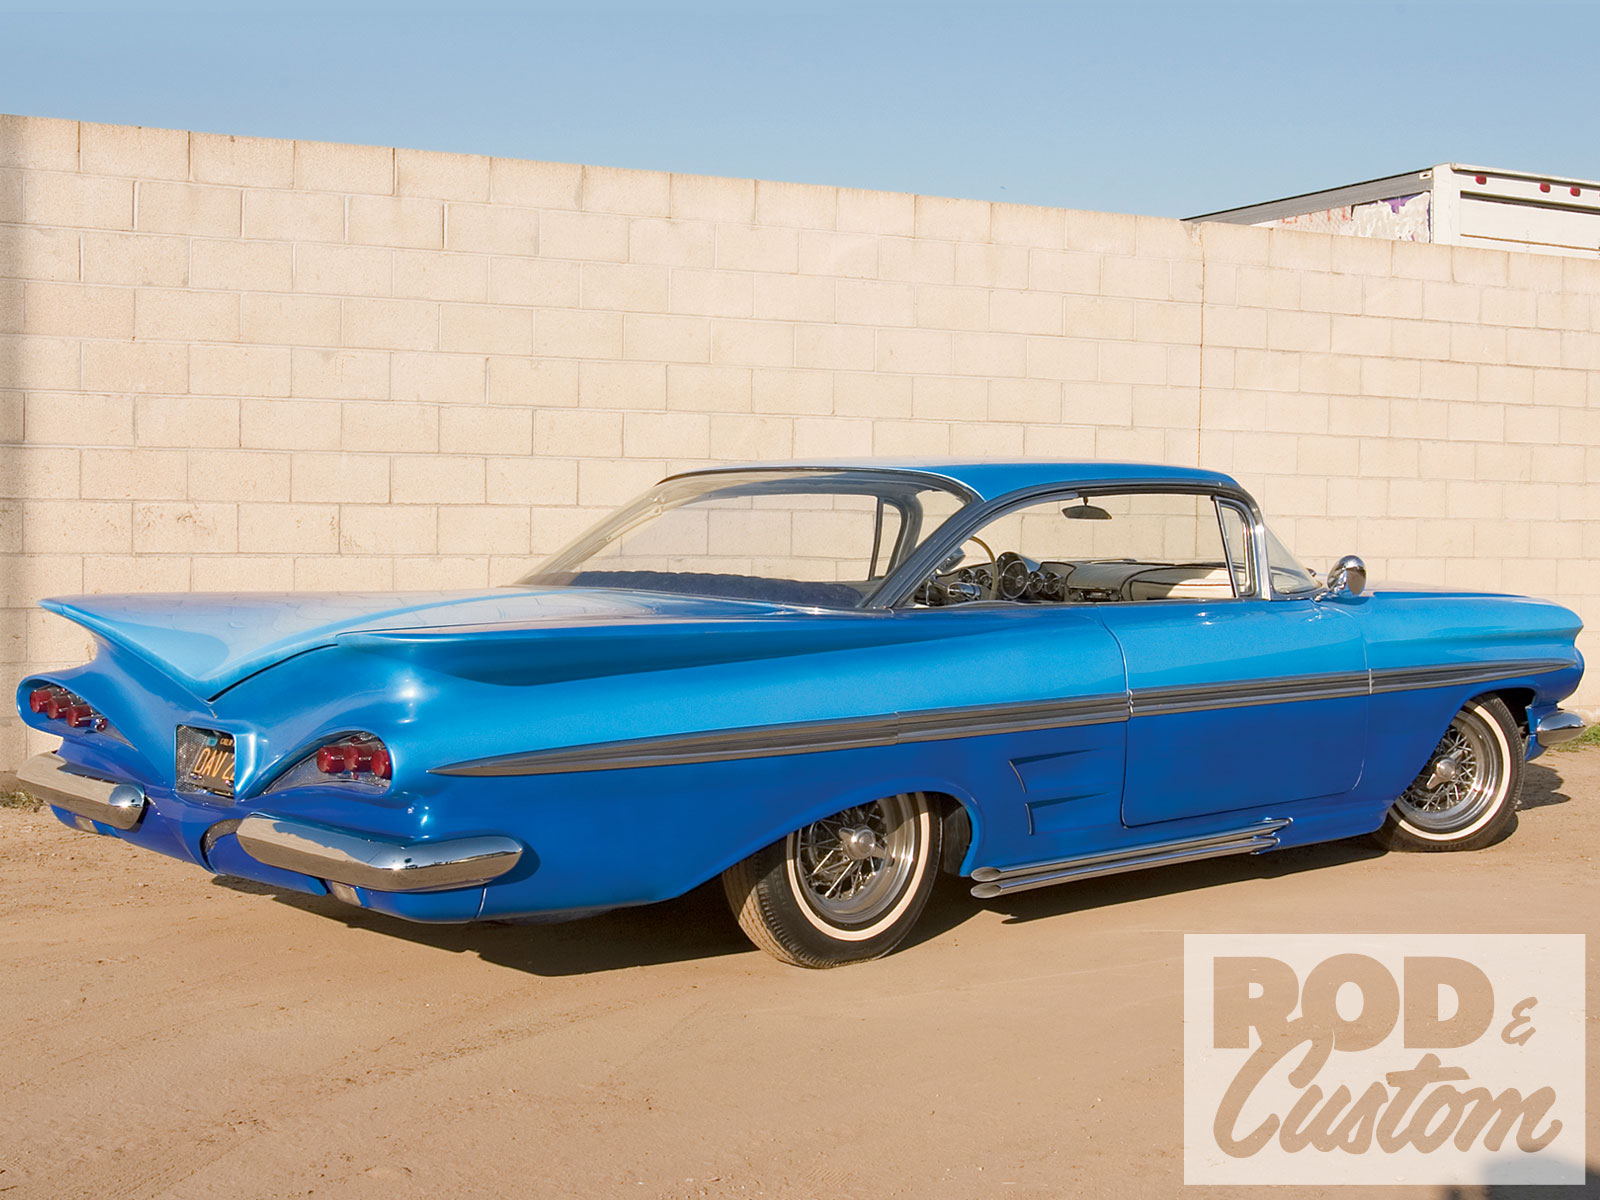 1959 Chevy Impala blue - YoWindow Forum